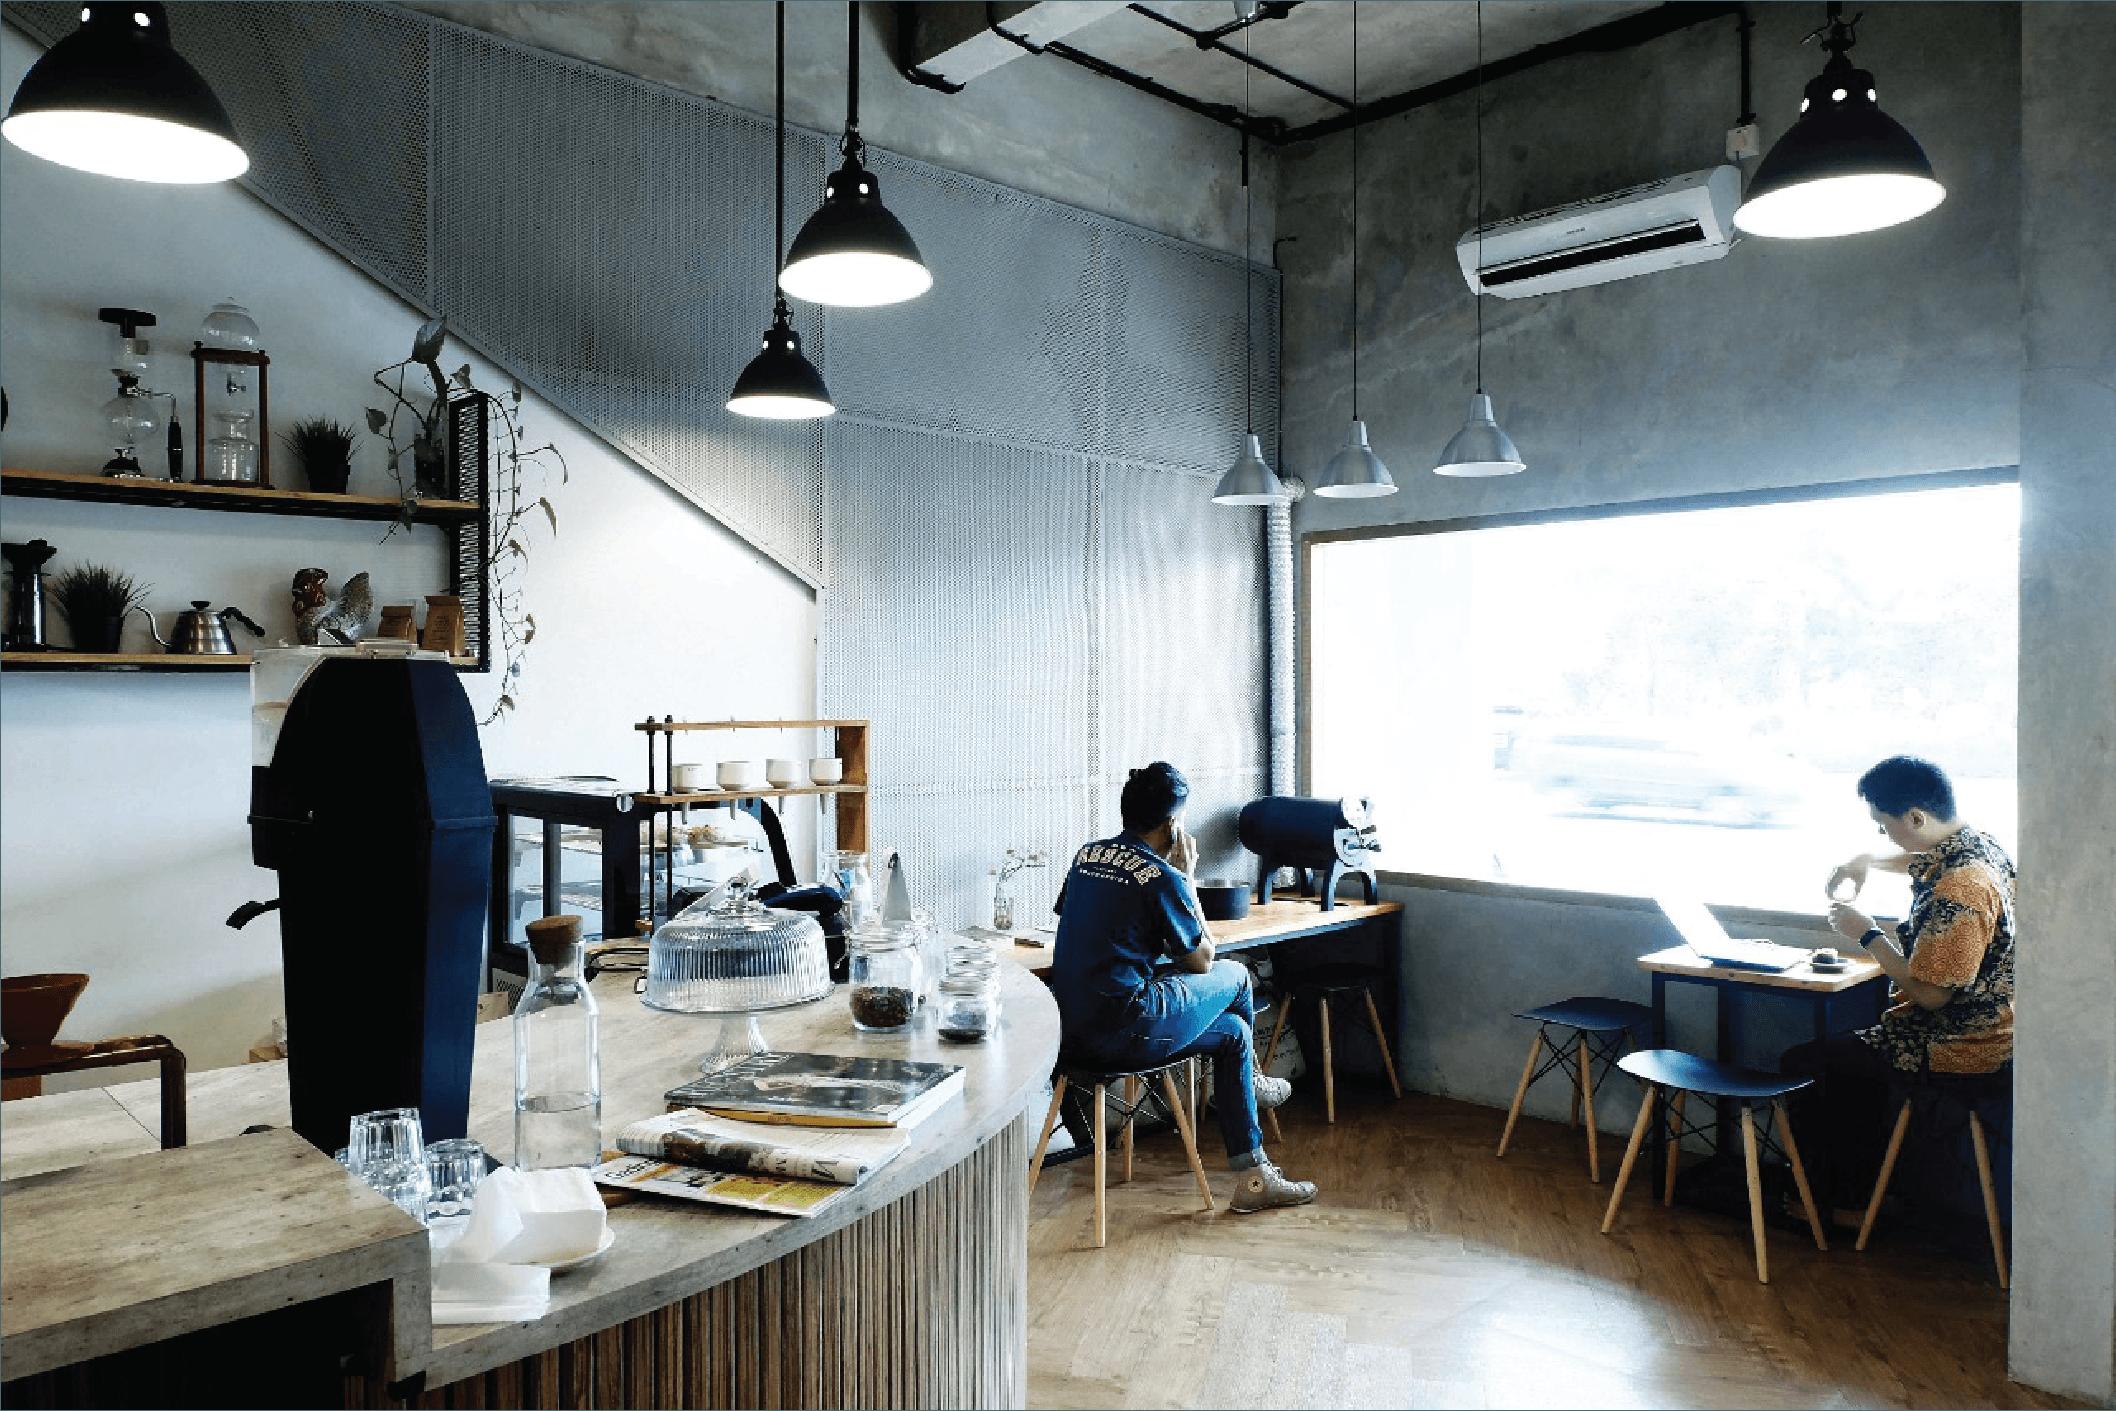 Sylvan Interior Design & Build Emmetropia Coffee Serpong, Kota Tangerang Selatan, Banten, Indonesia Serpong, Kota Tangerang Selatan, Banten, Indonesia Sylvan-Interior-Design-Emmetropia-Coffee  83358